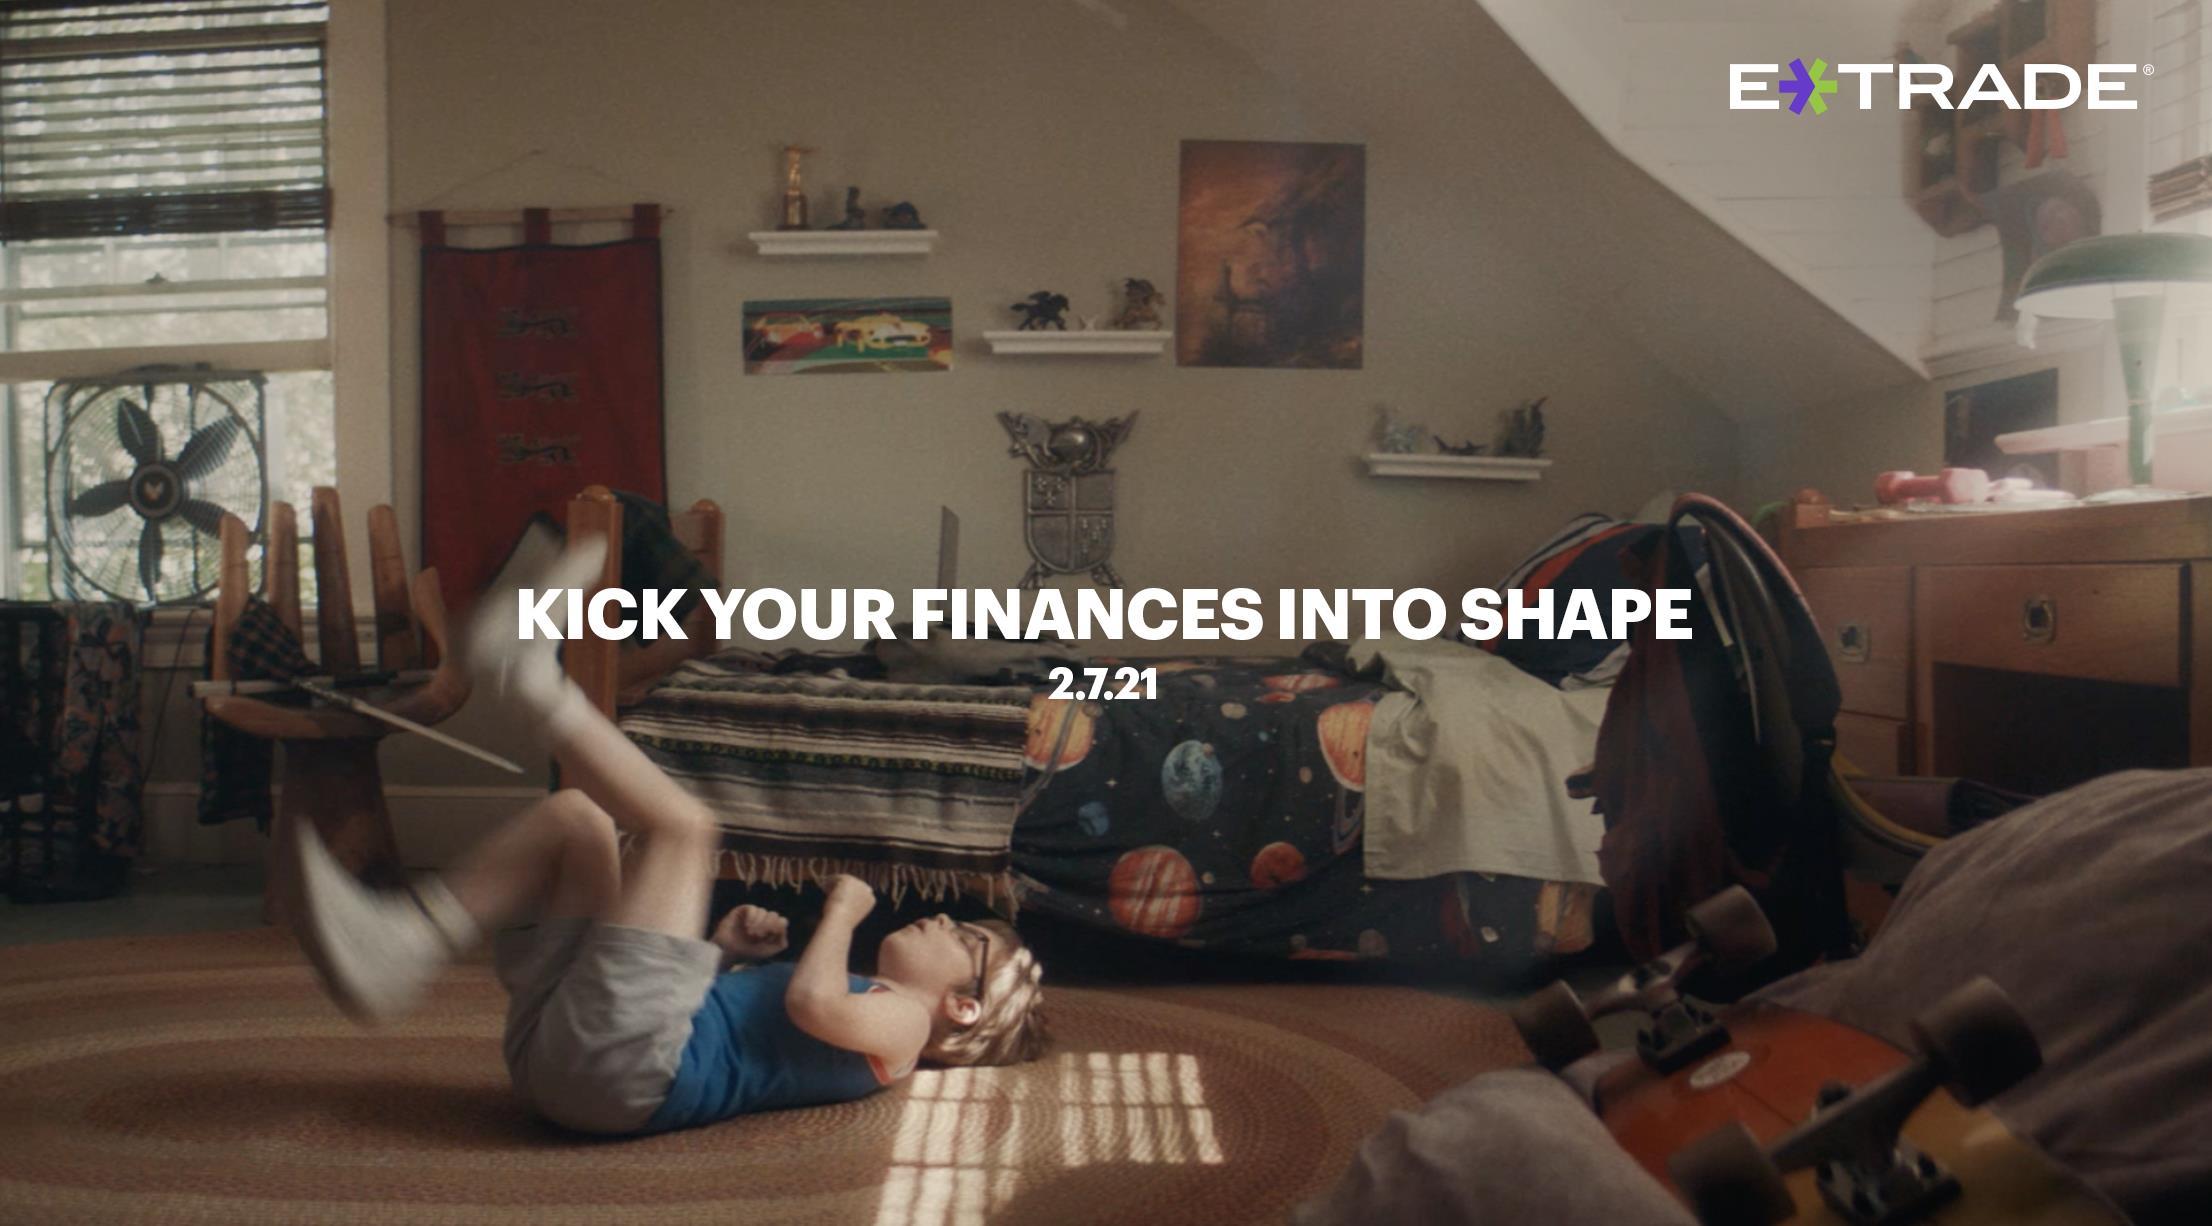 E*TRADE Commercial – Workout - Full Spot